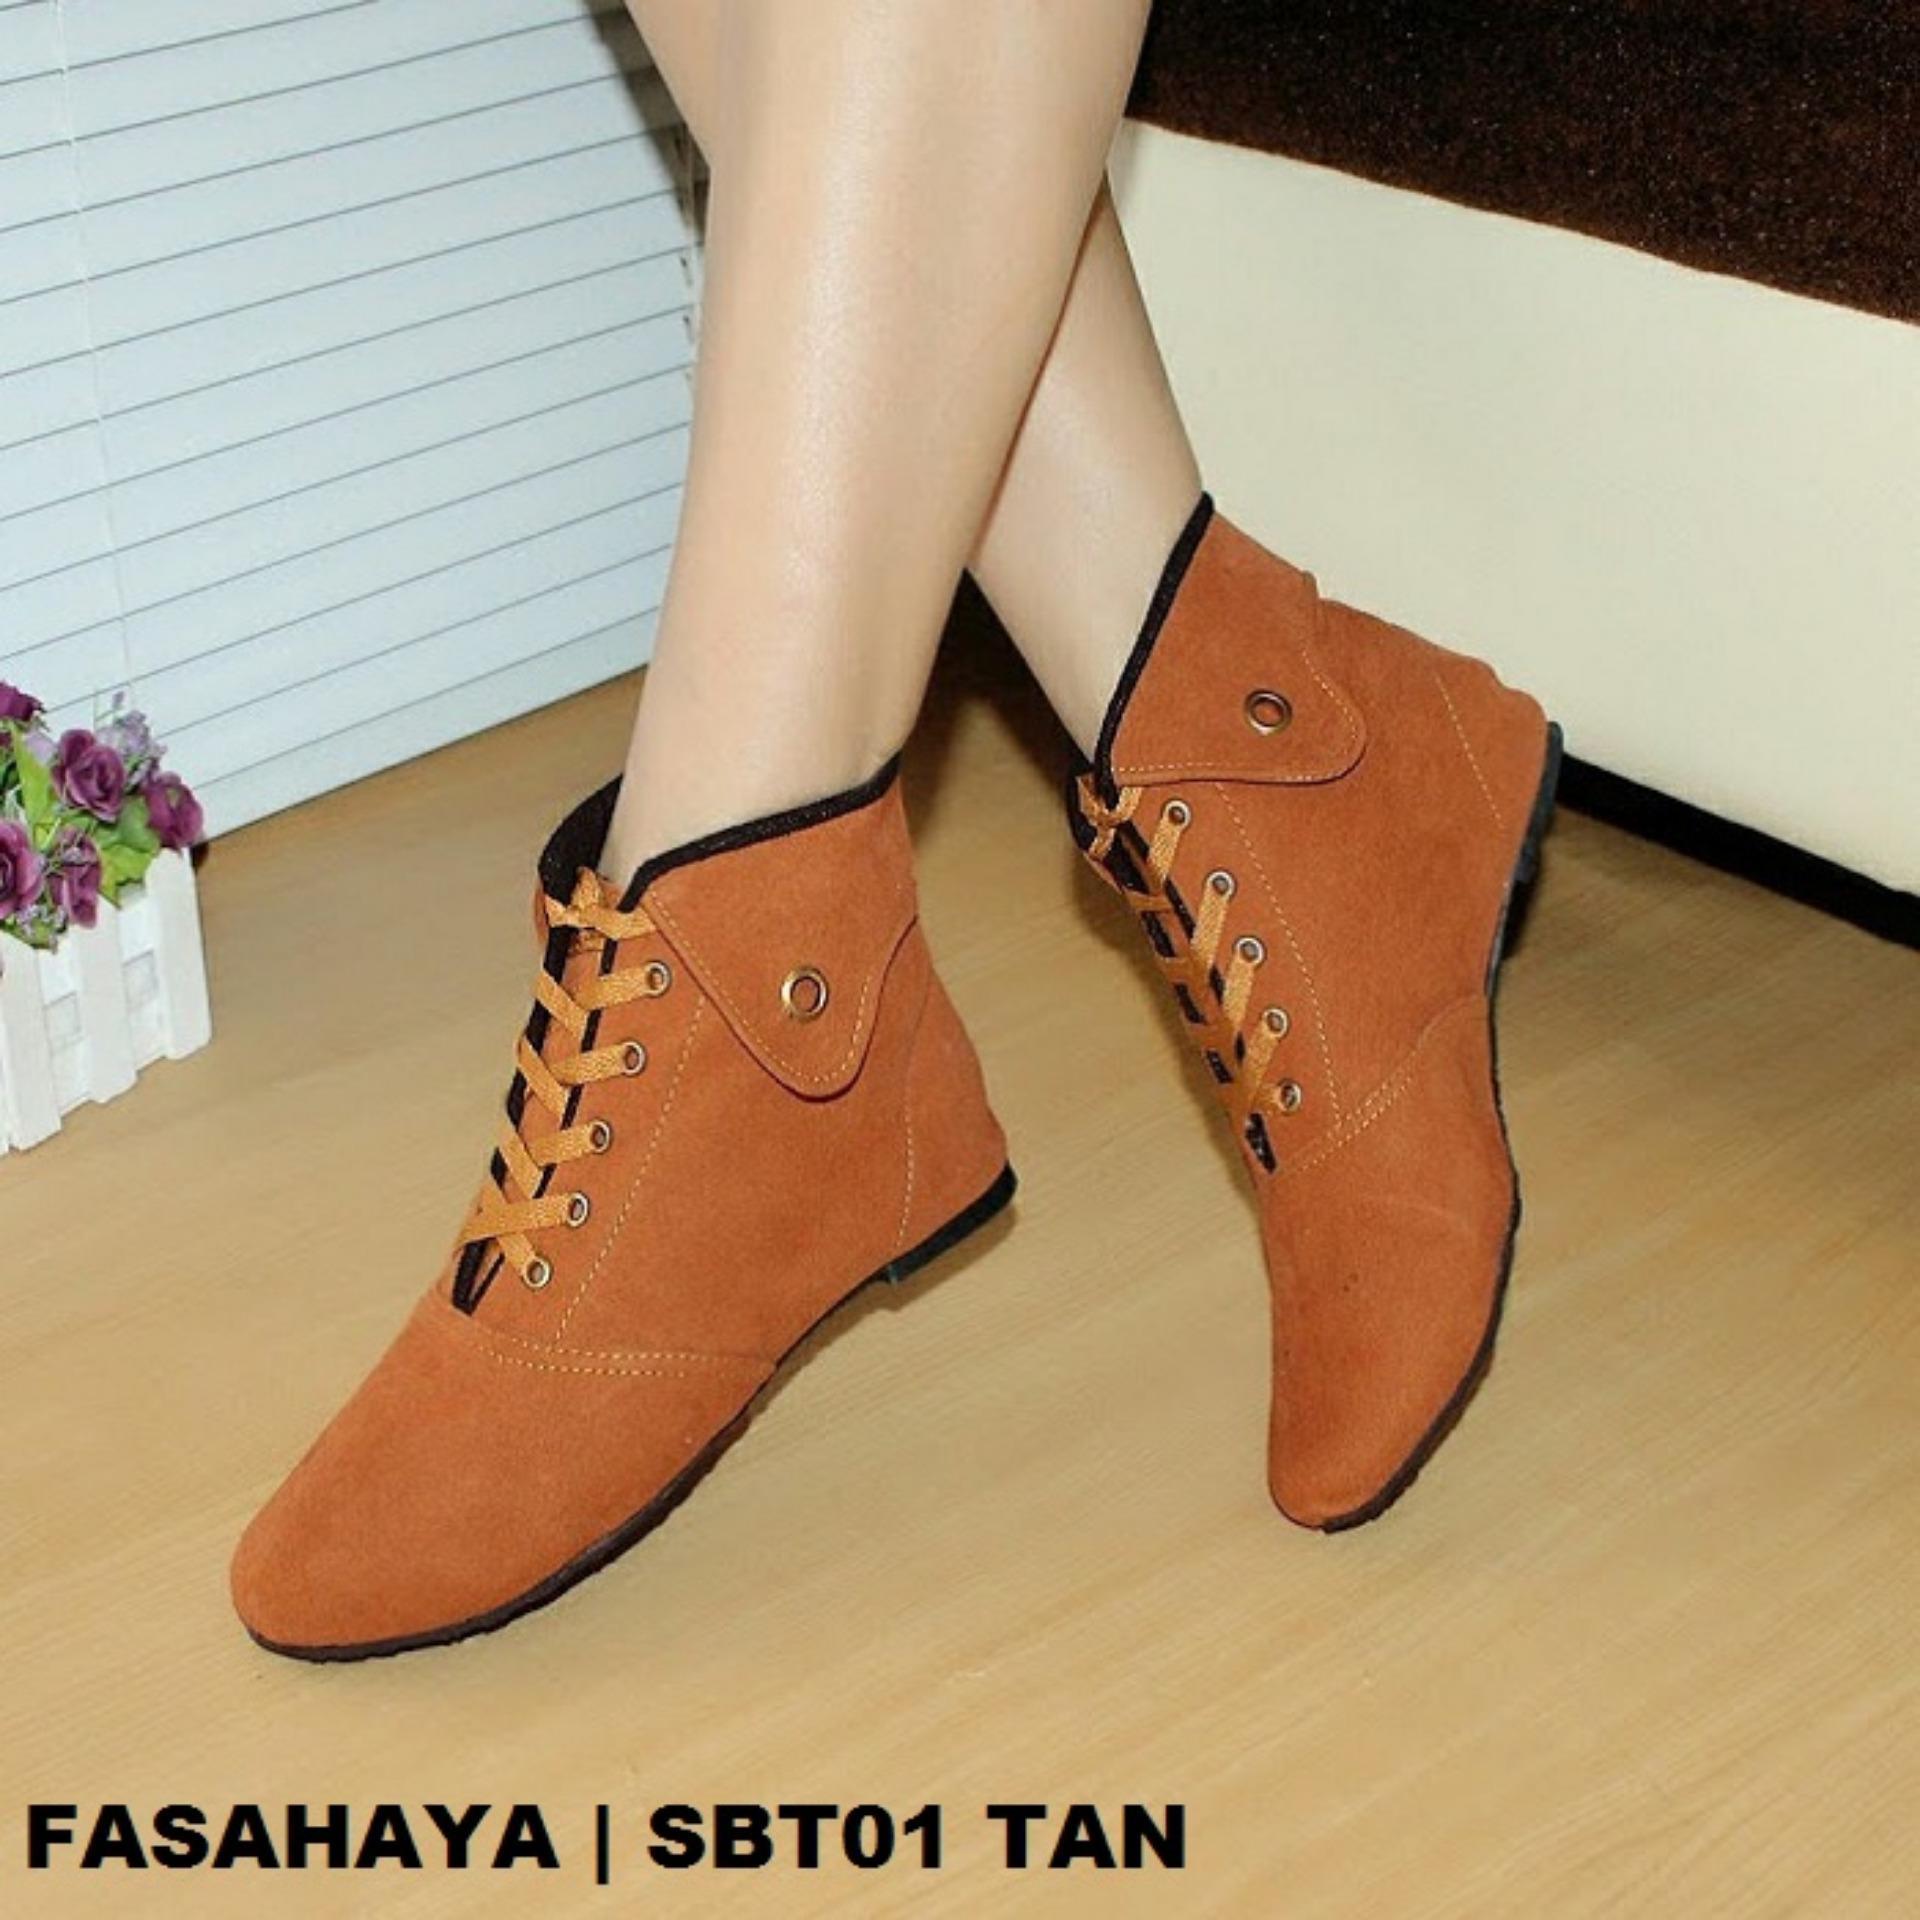 Boots Fasahaya Lazada co id Source Fasahaya Sepatu Wanita Boots Korea Cantik Terbaru .